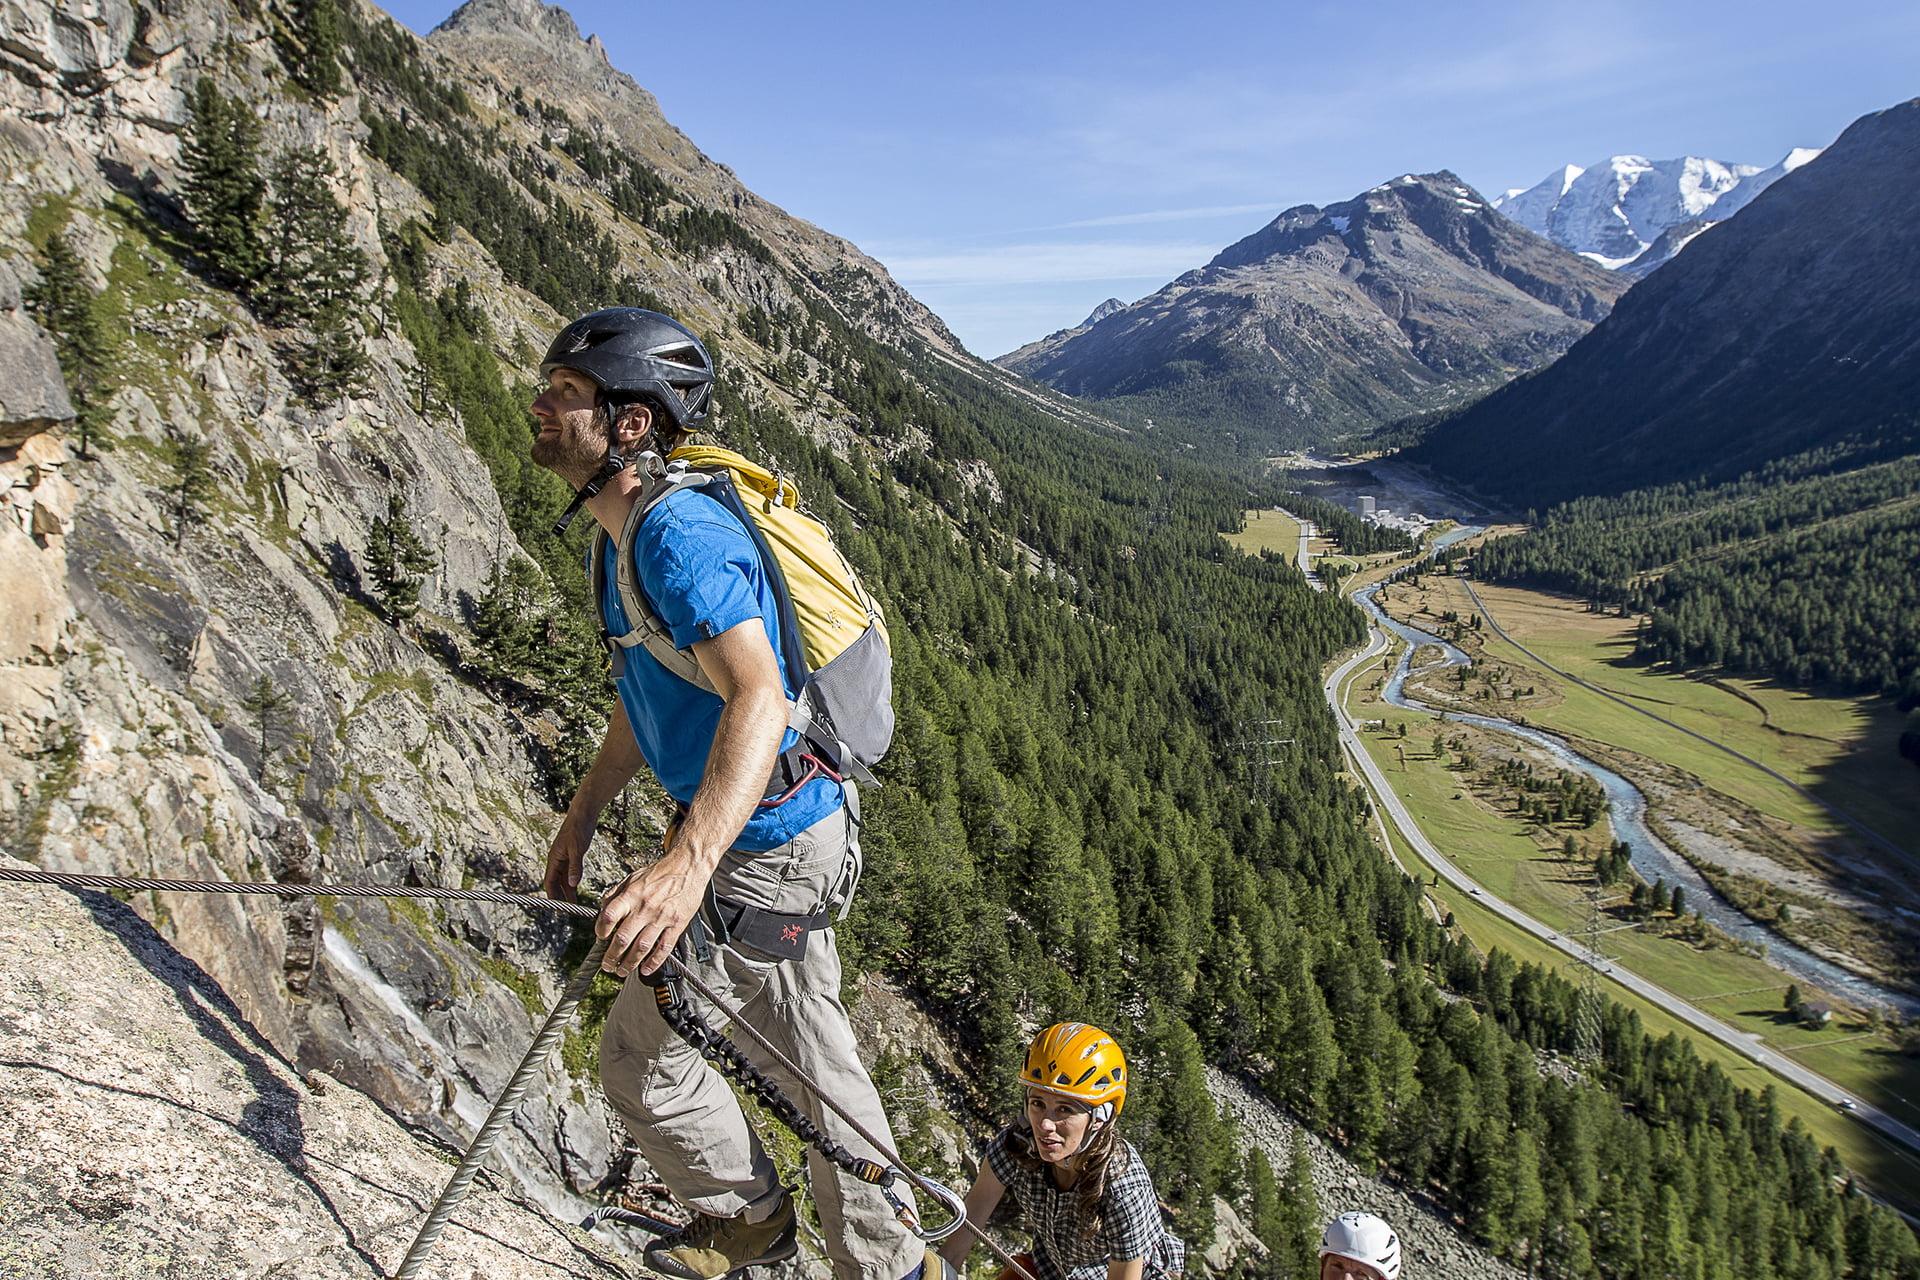 Klettersteig La Resgia : Klettersteig la resgia sommer in engadin st moritz